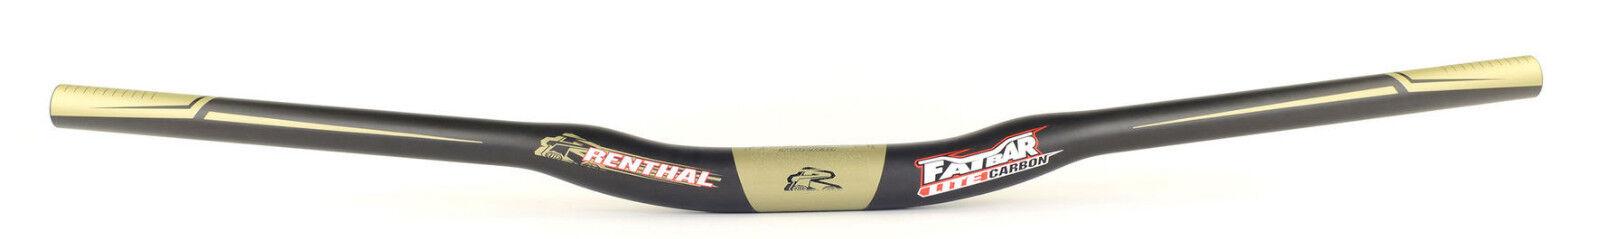 Renthal Fatbar Lite Carbono MTB Bici de Montaña Barra 35.0 X 20mm Subir X 760mm